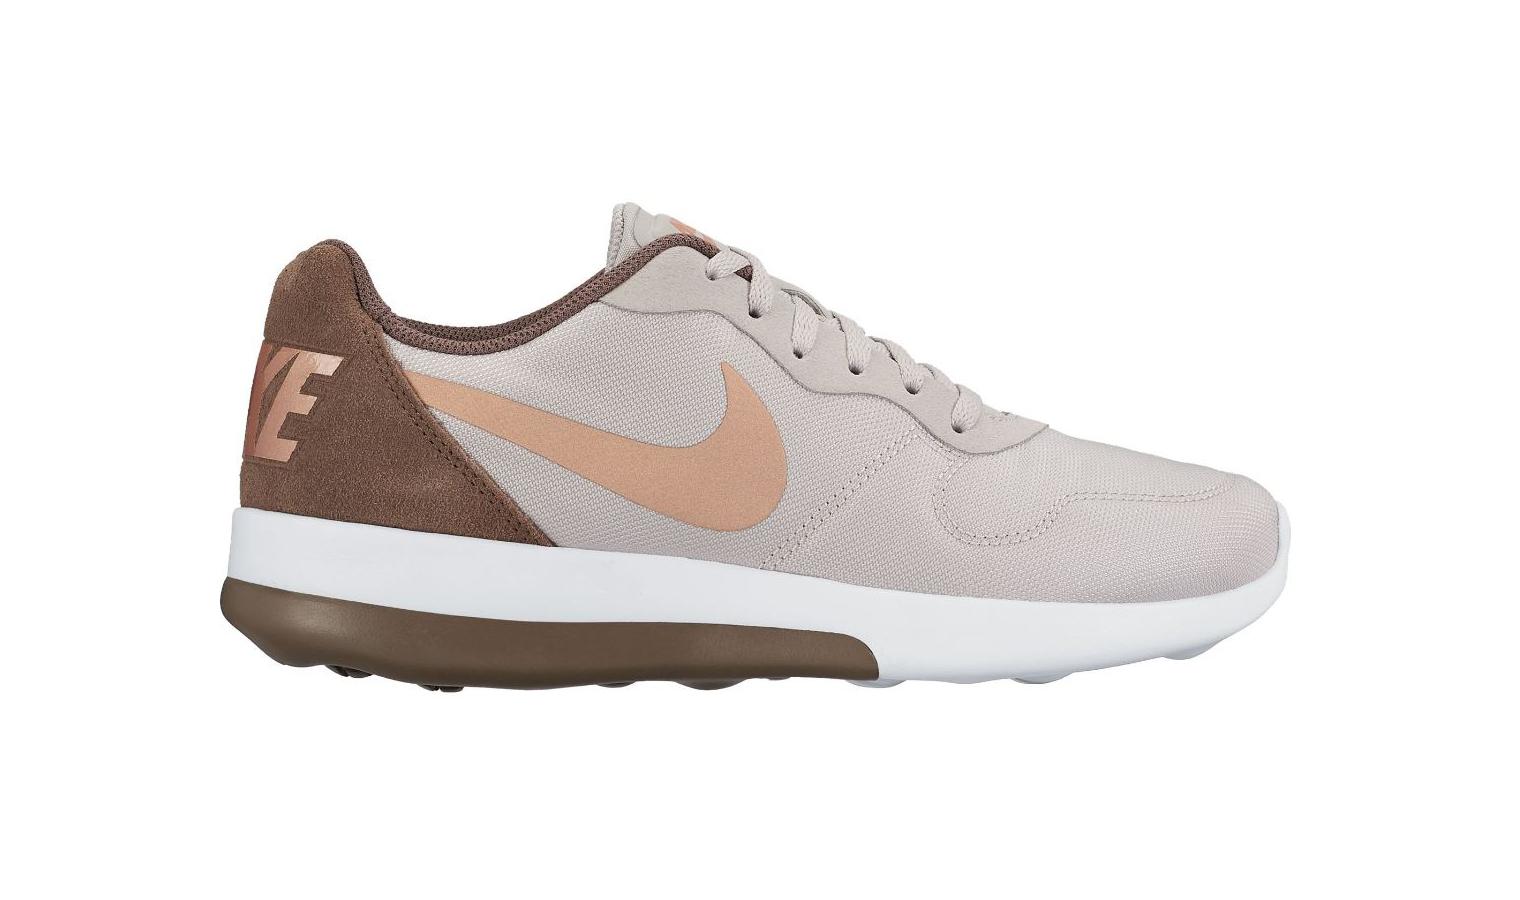 Dámske topánky Nike MD RUNNER 2 LW ružové  b19d34d4112e3